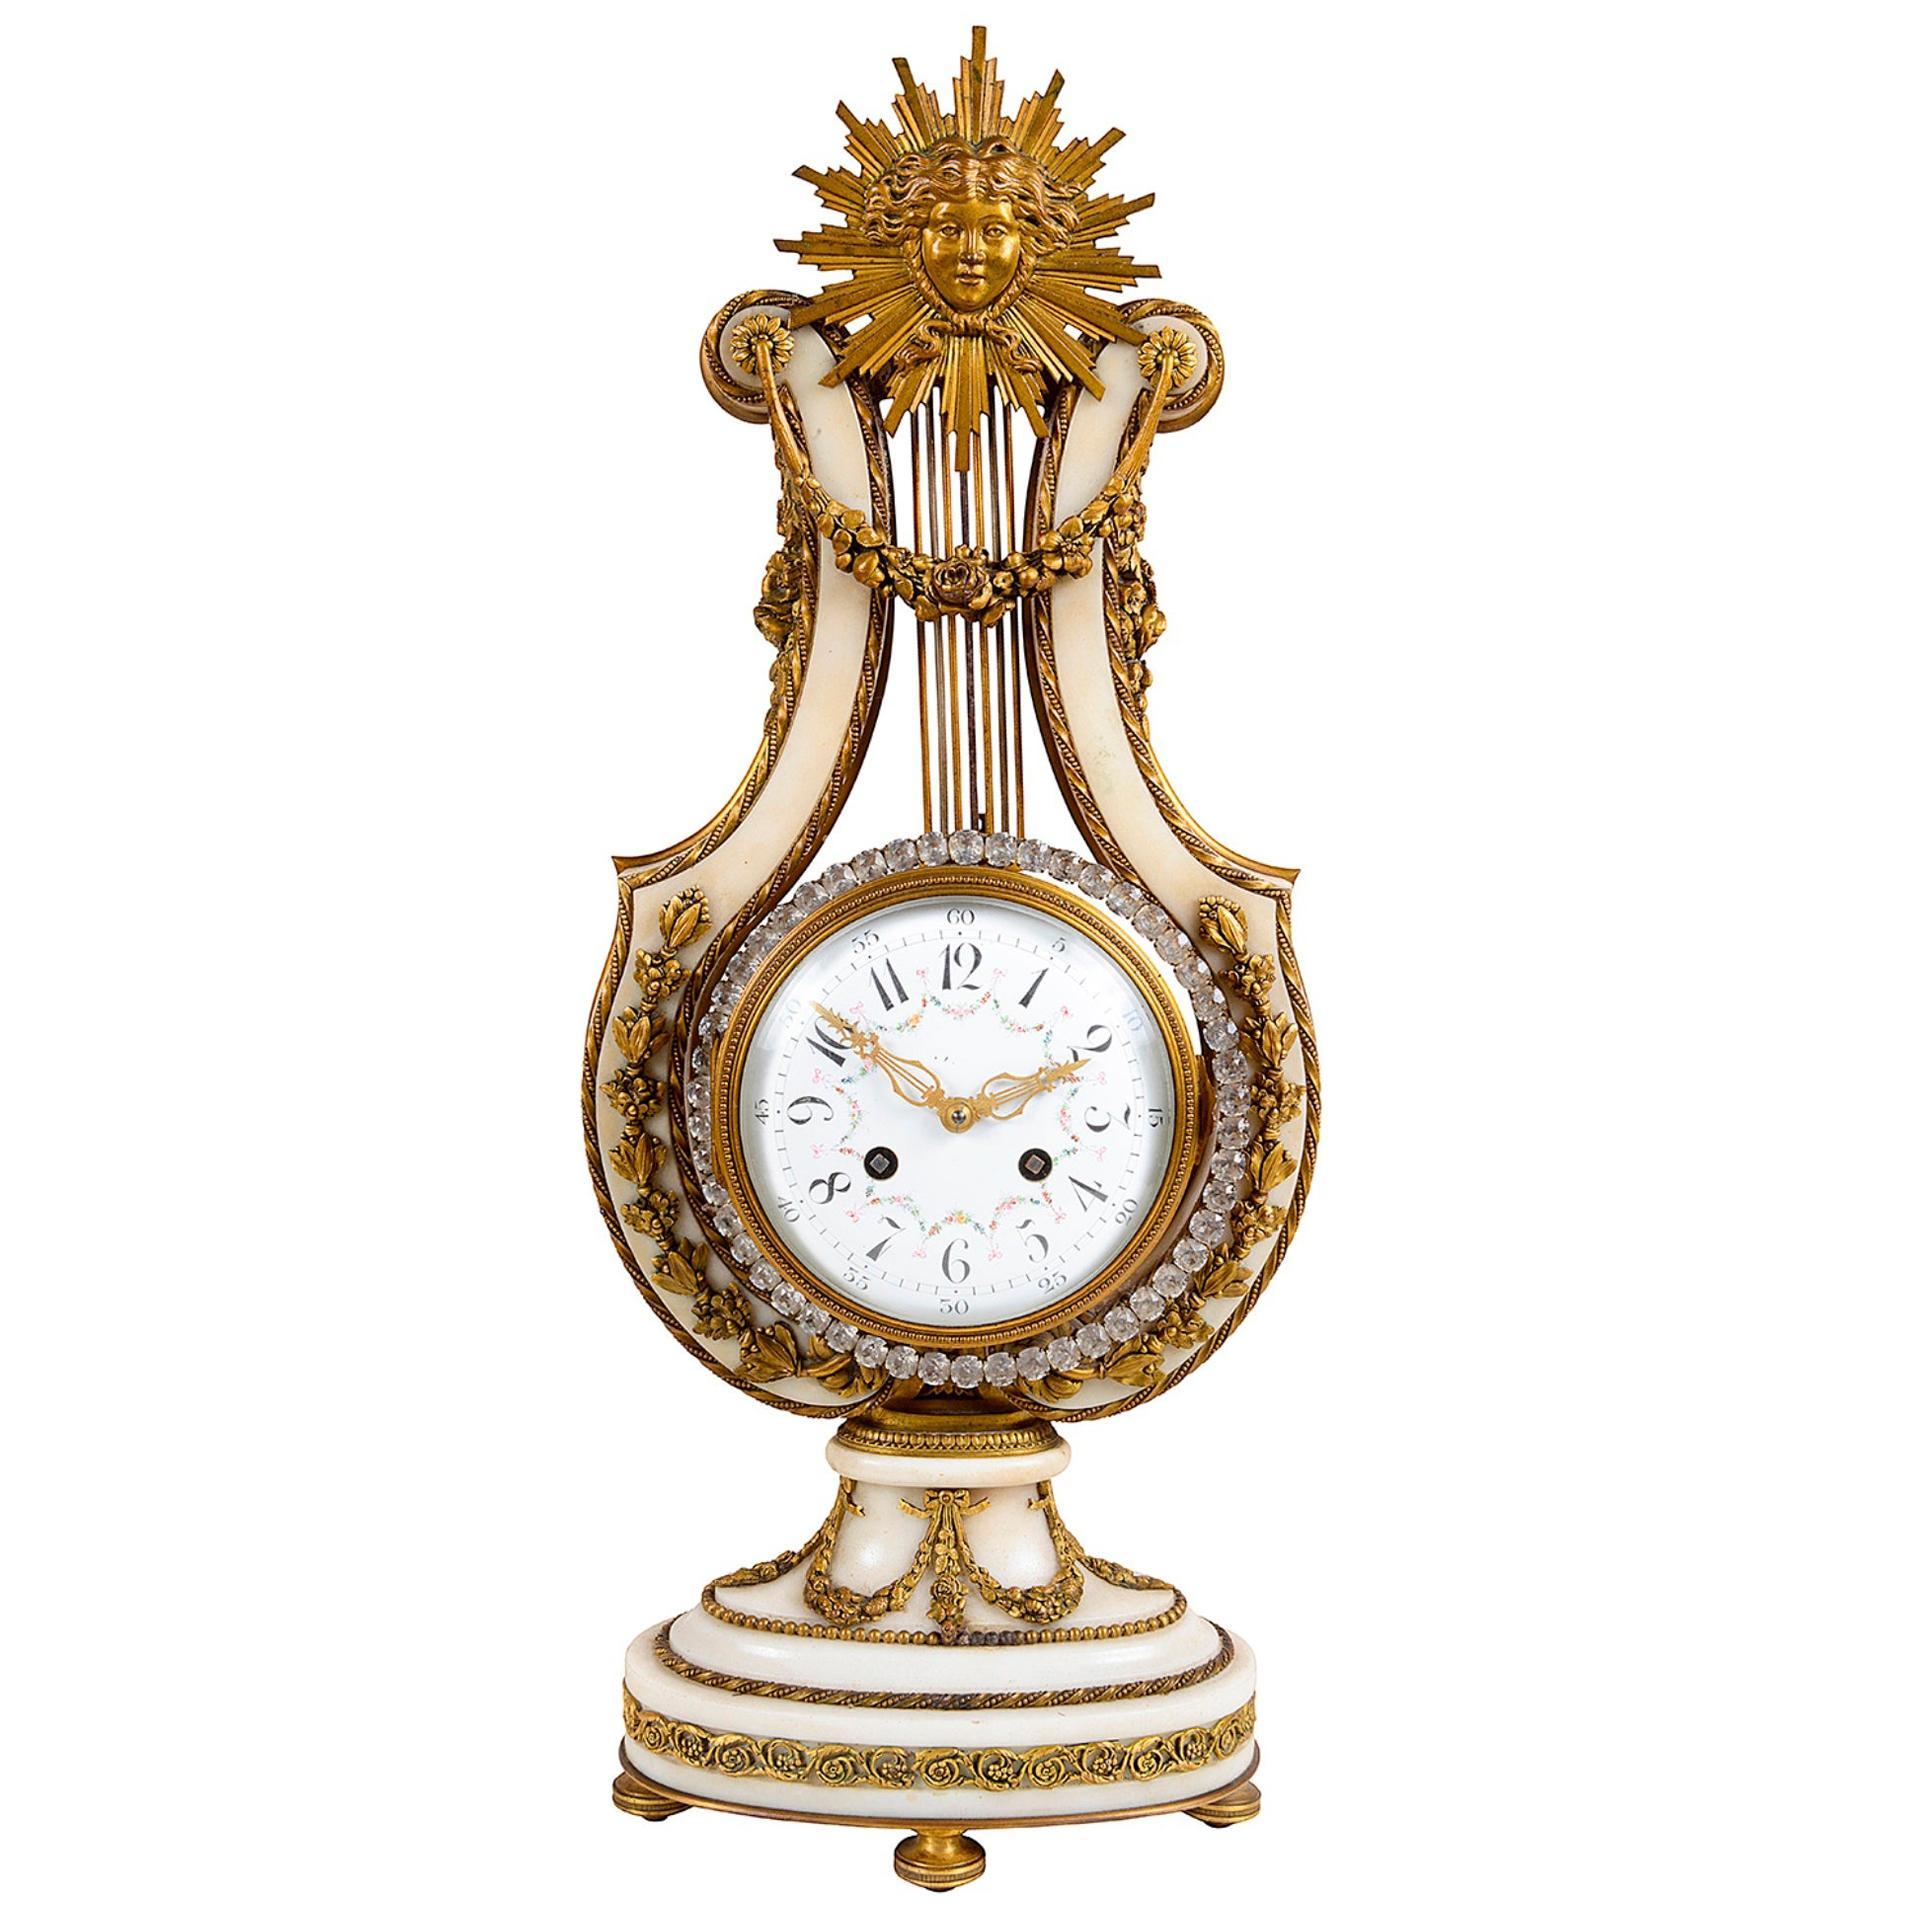 19th Century French Louis XVI Style Lyre Shape Clock